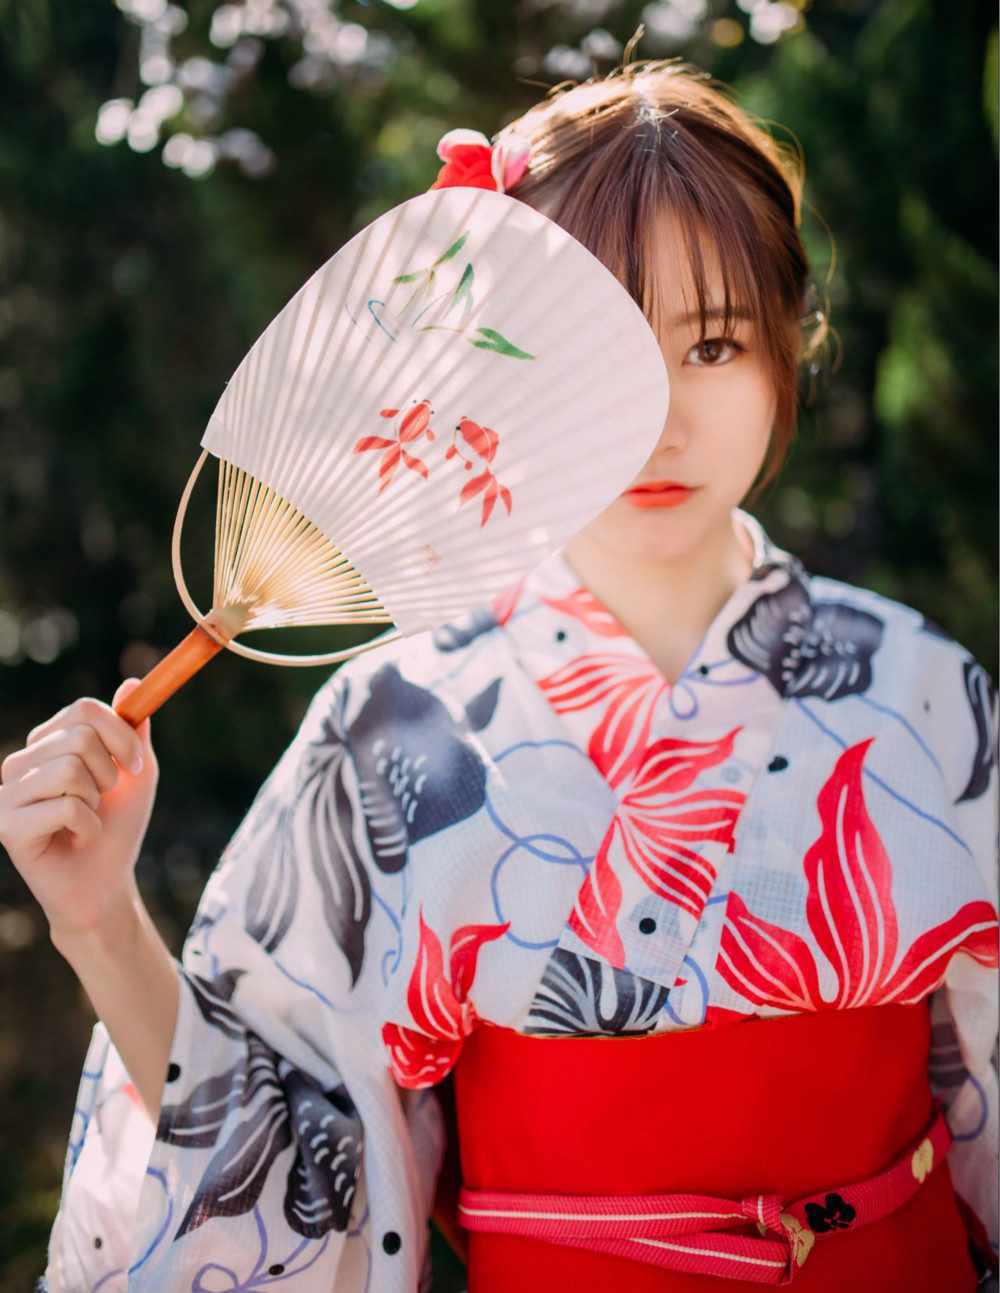 Traditional Japanese Yukata White Print Women Elegant Kimono Formal Evening Dress Classic Stage Show Clothes Cosplay Clothing